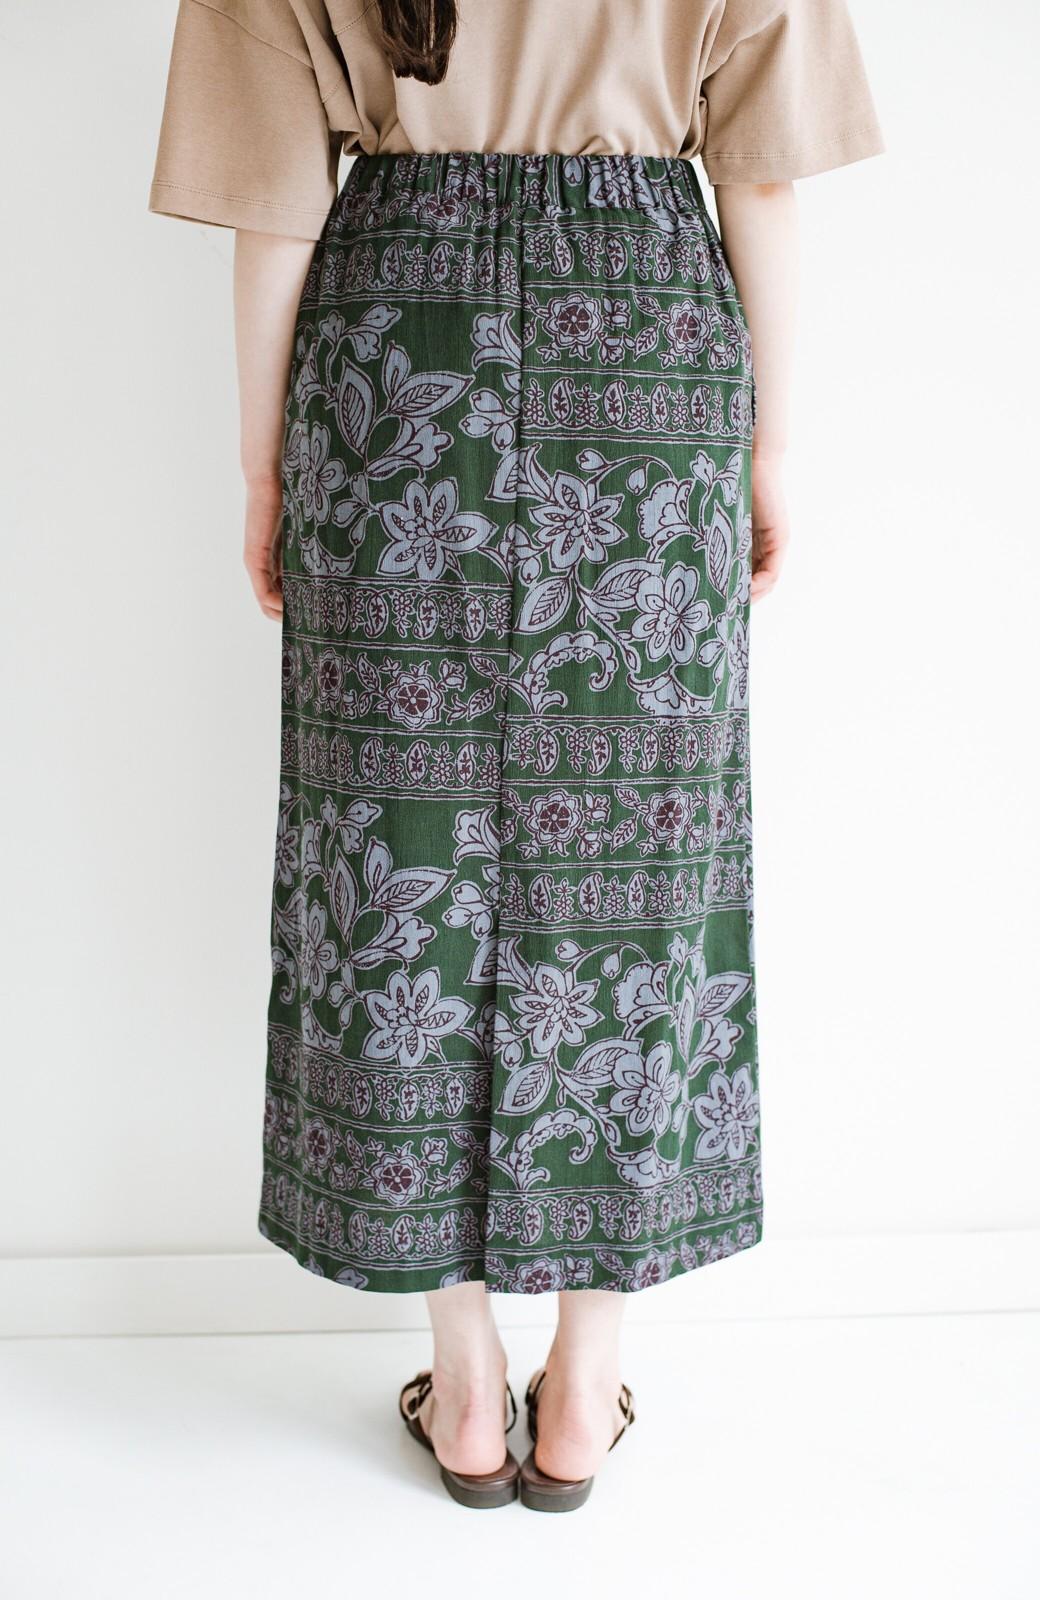 haco! 京都の浴衣屋さんと作った浴衣生地のセミタイトスカート <グリーン系その他>の商品写真7